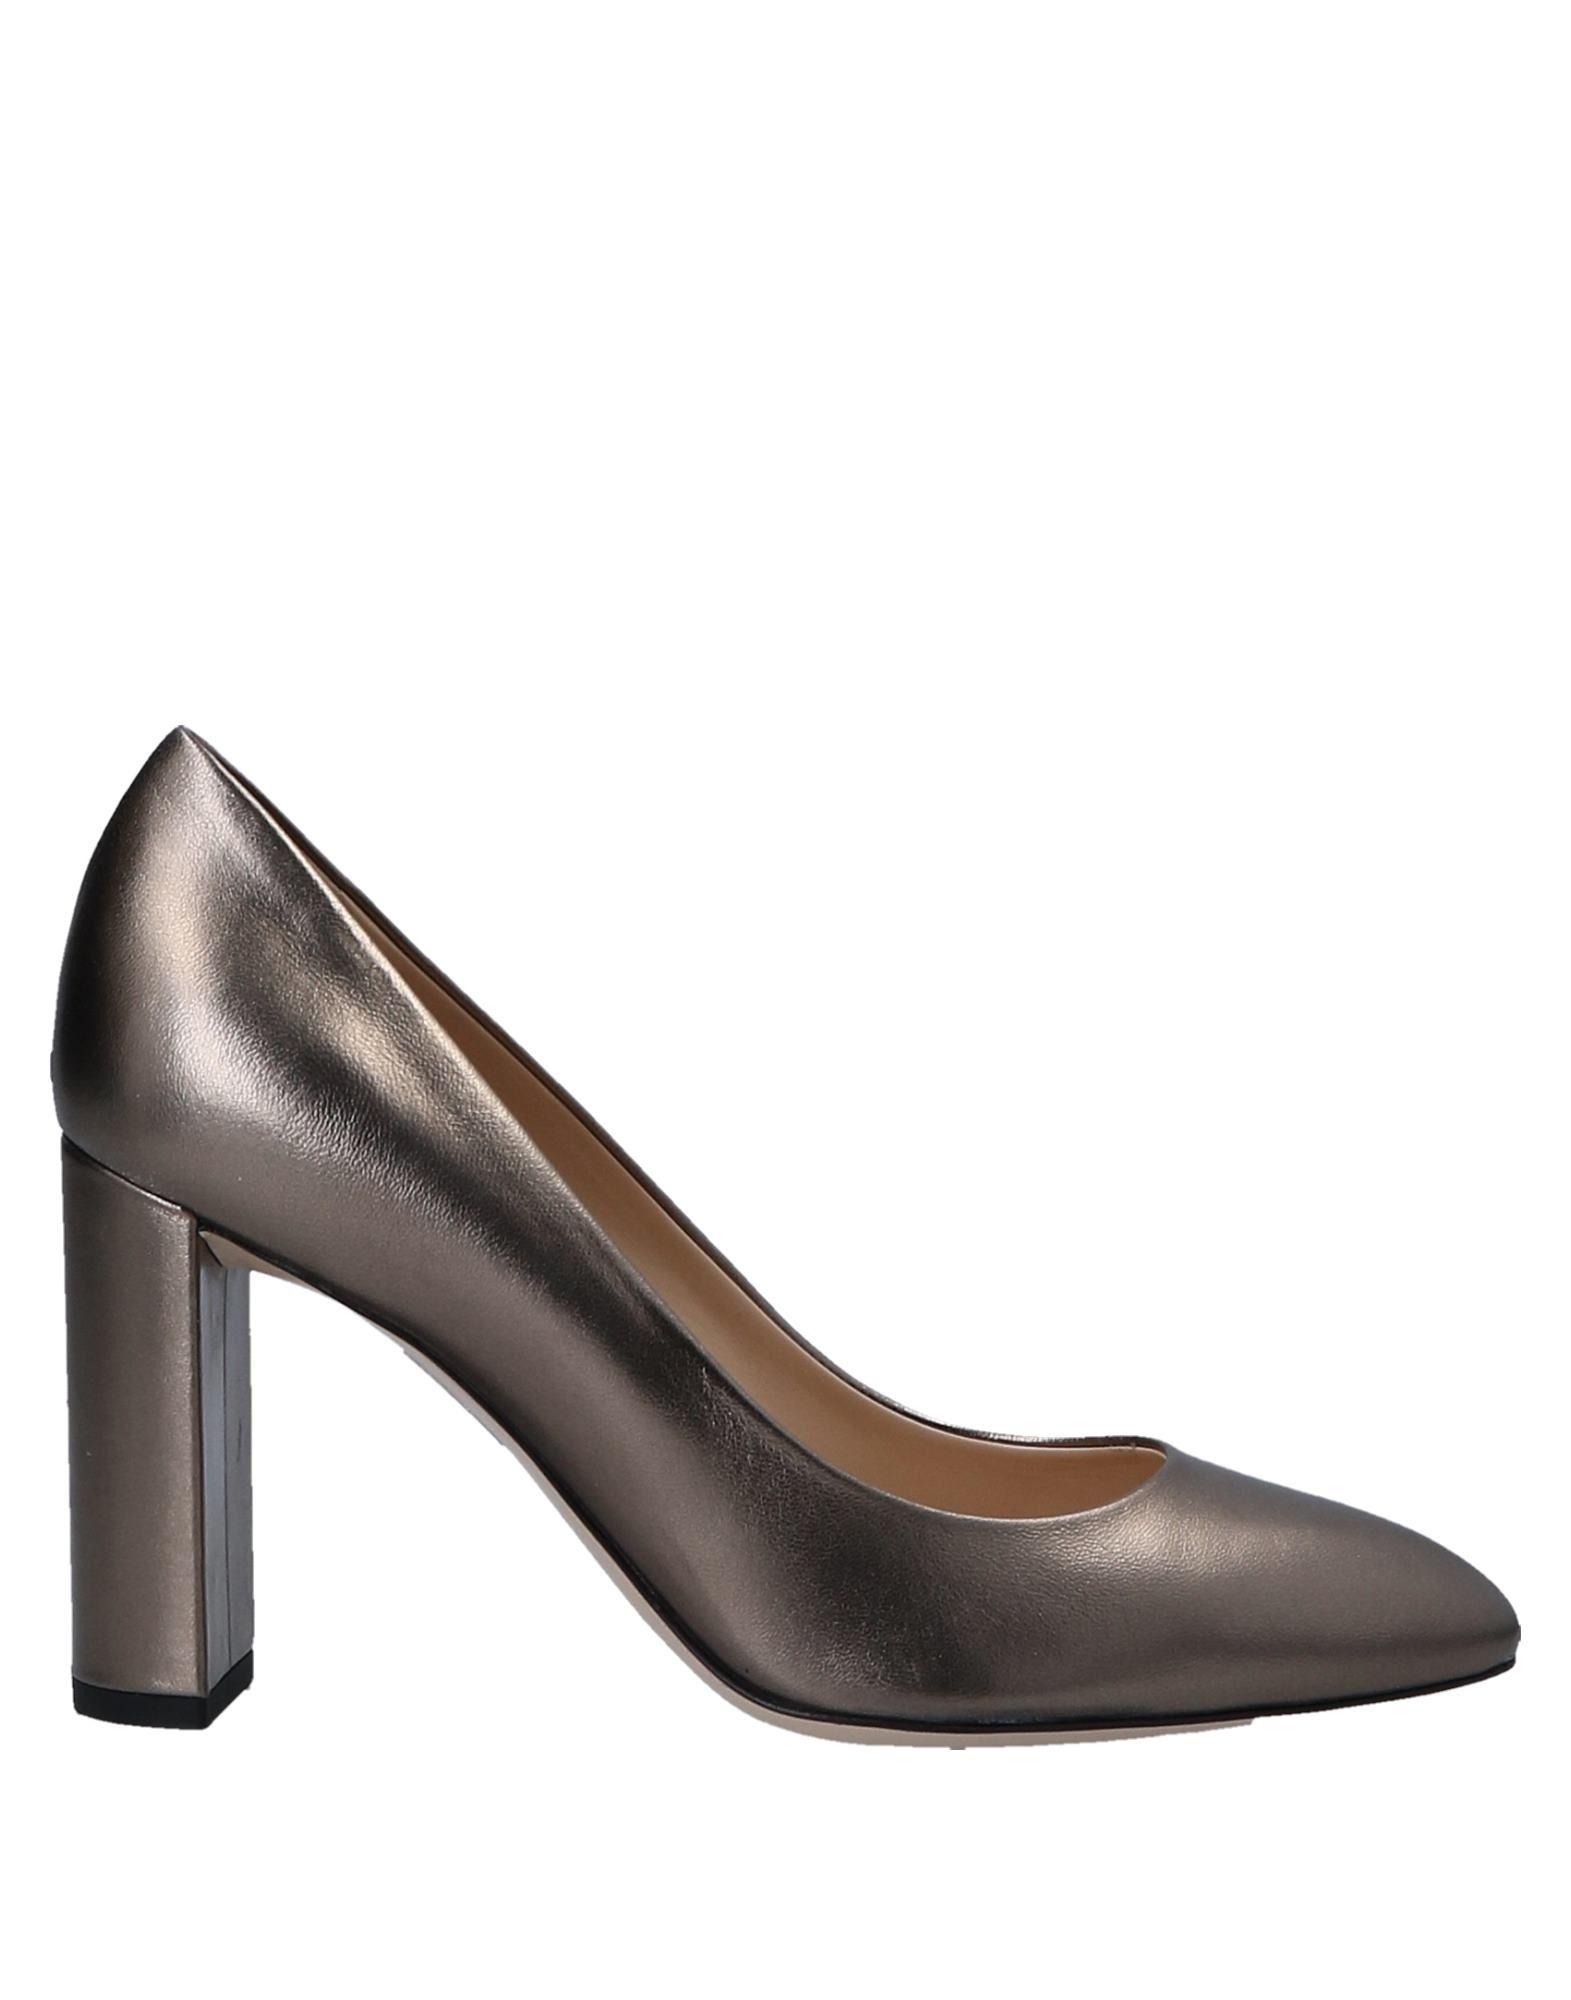 Stilvolle billige Schuhe Damen Deimille Pumps Damen Schuhe  11556982VD 5fda64